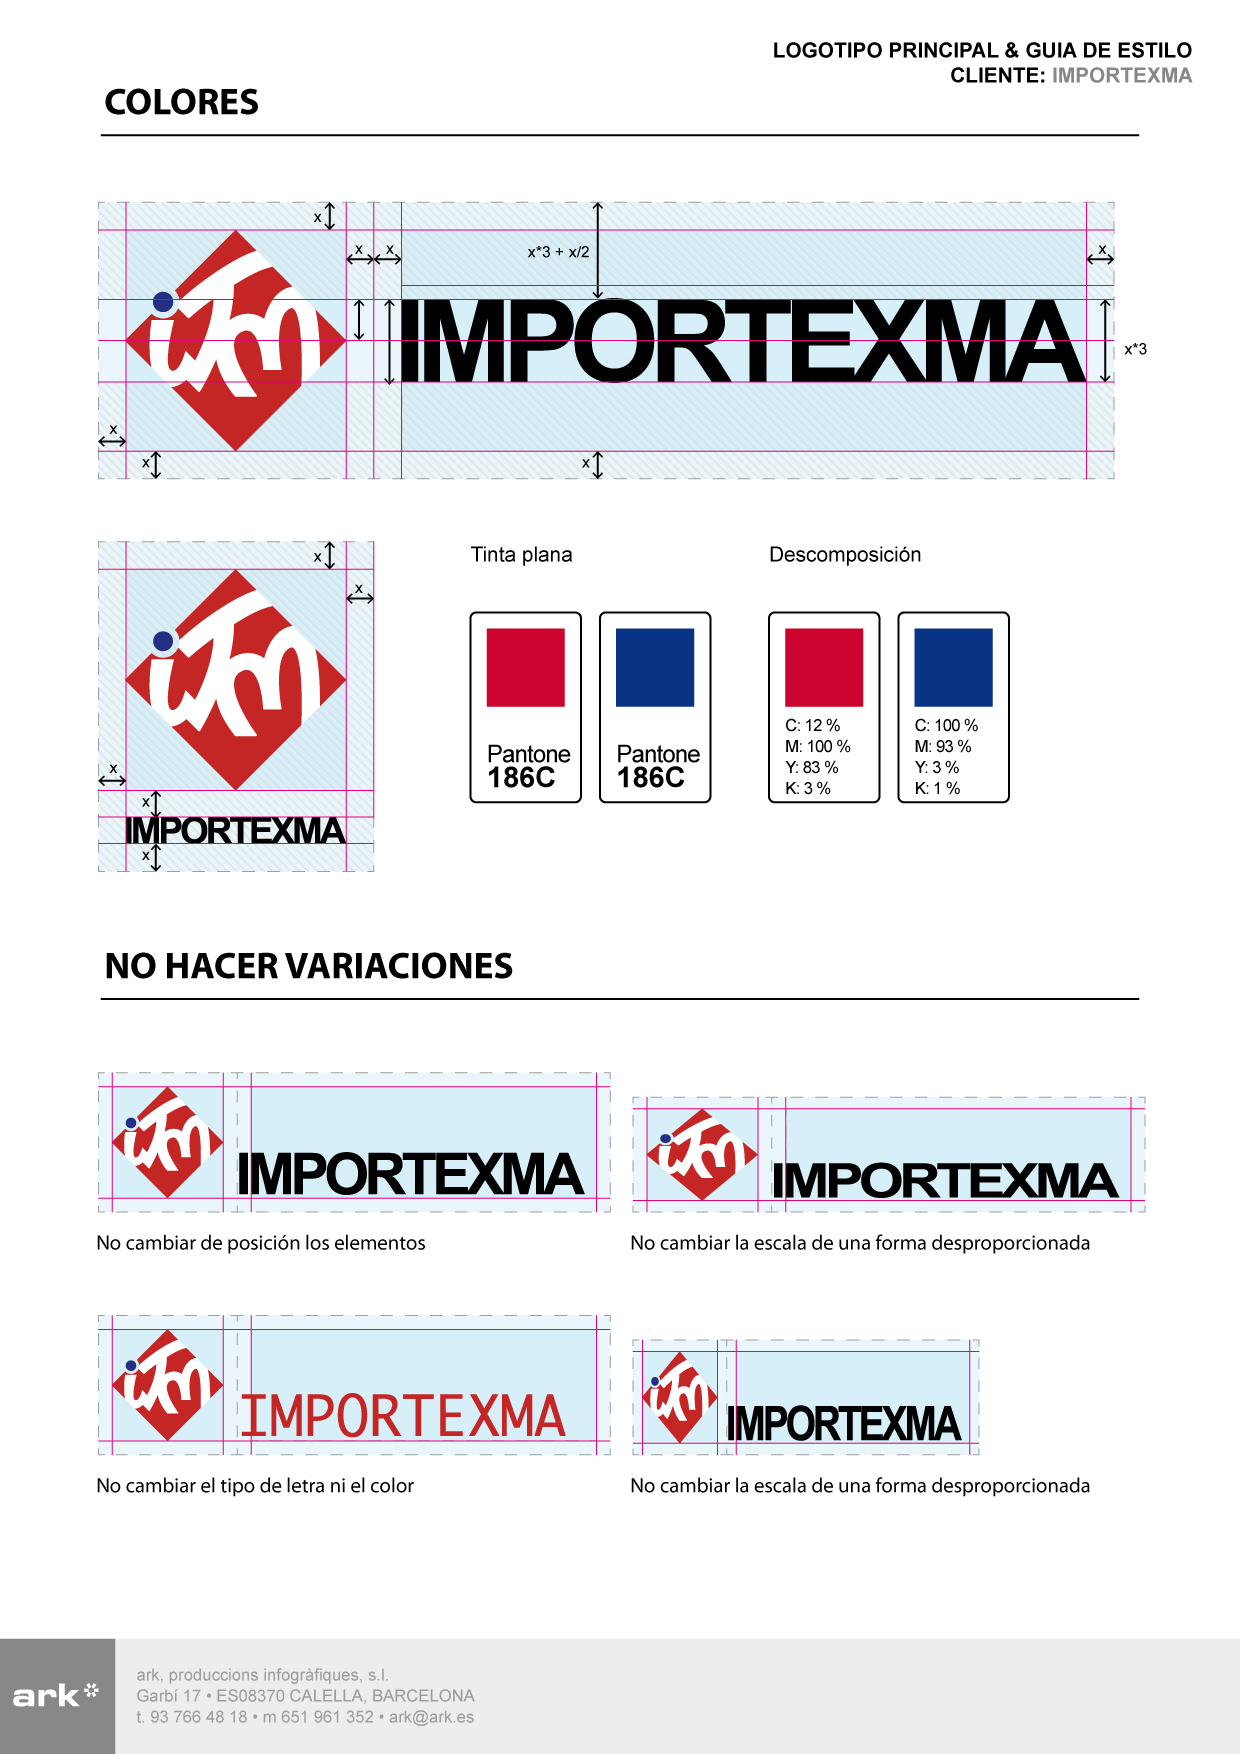 Importexma